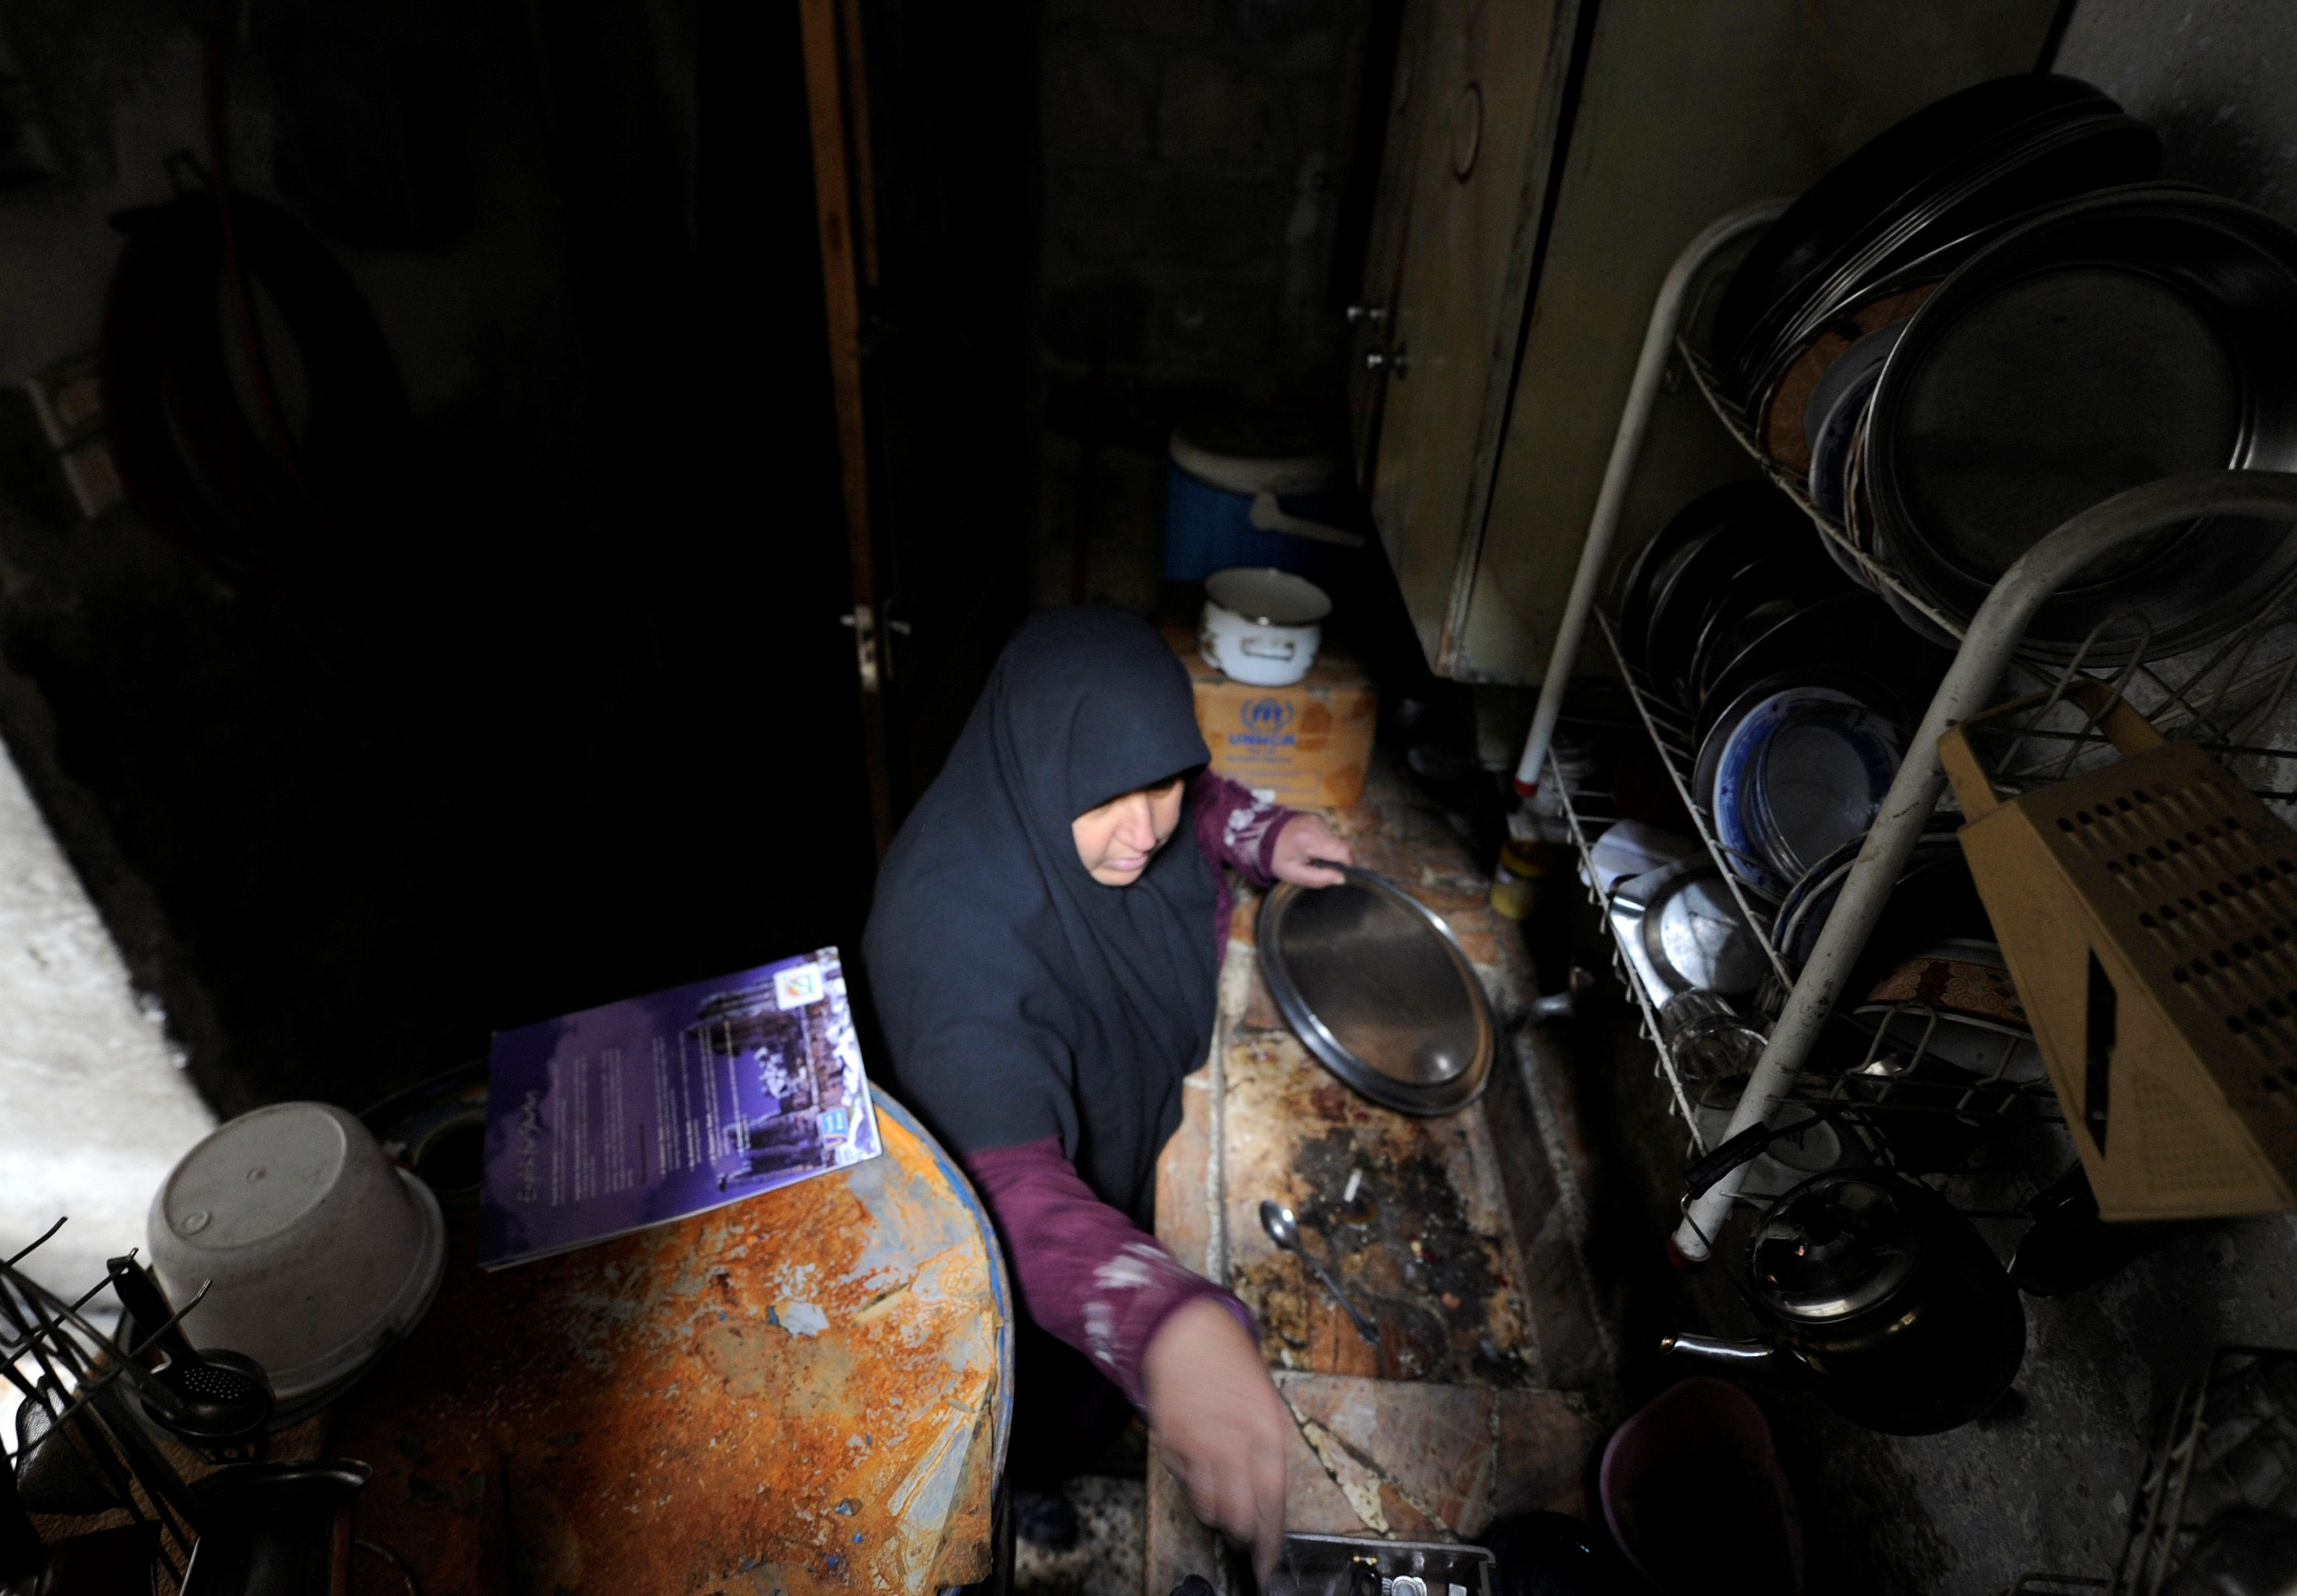 Heyam Batash, 56, works inside her kitchen in al-Mouassassi street in Aleppo, Syria, January 30, 2017. Picture taken January 30, 2017. REUTERS/Omar Sanadiki